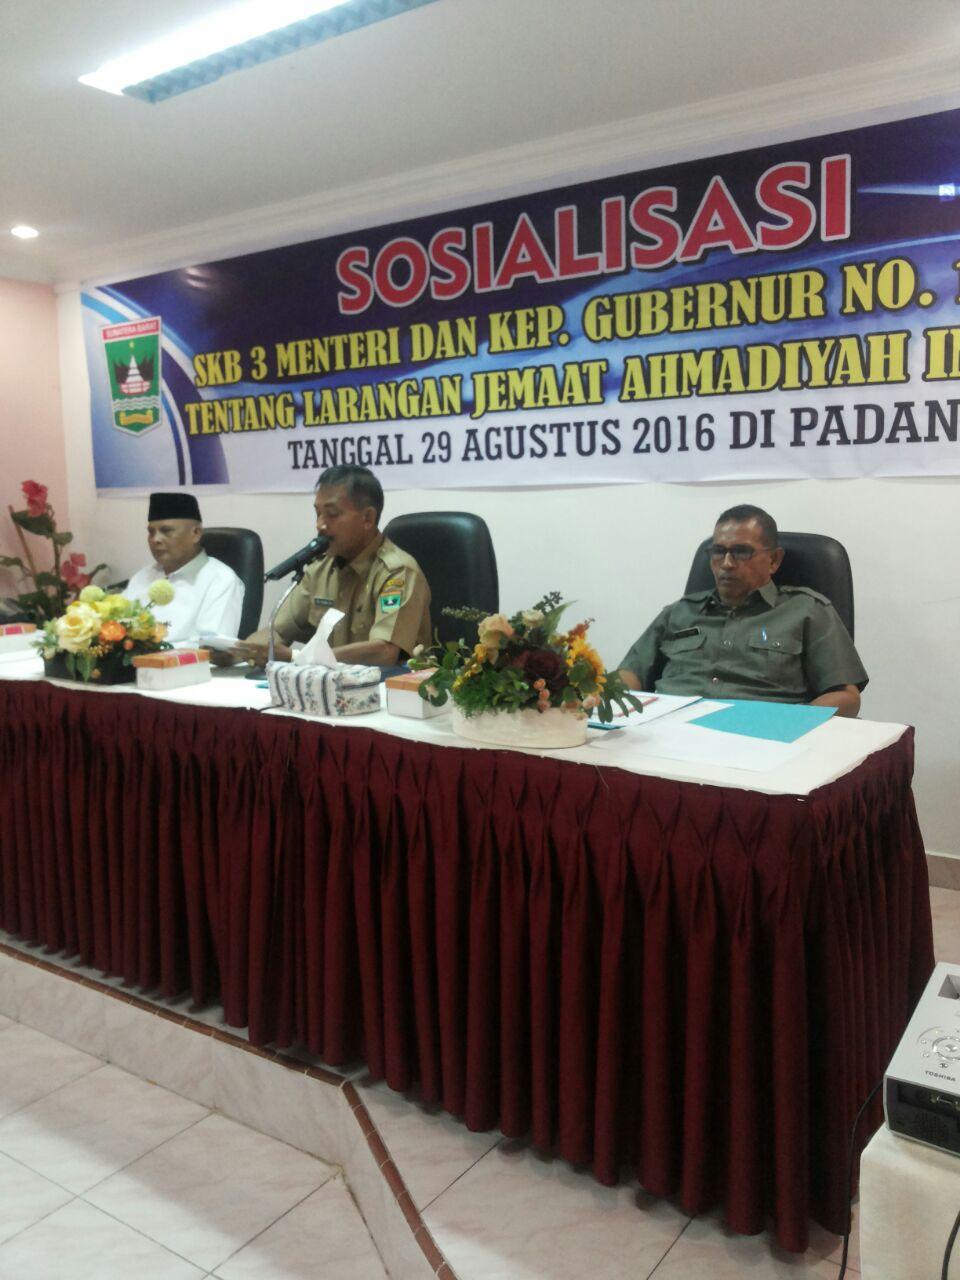 Wakili Gubernur, Kaban Kesbangpol buka Sosialisasi SKB 3 Menteri